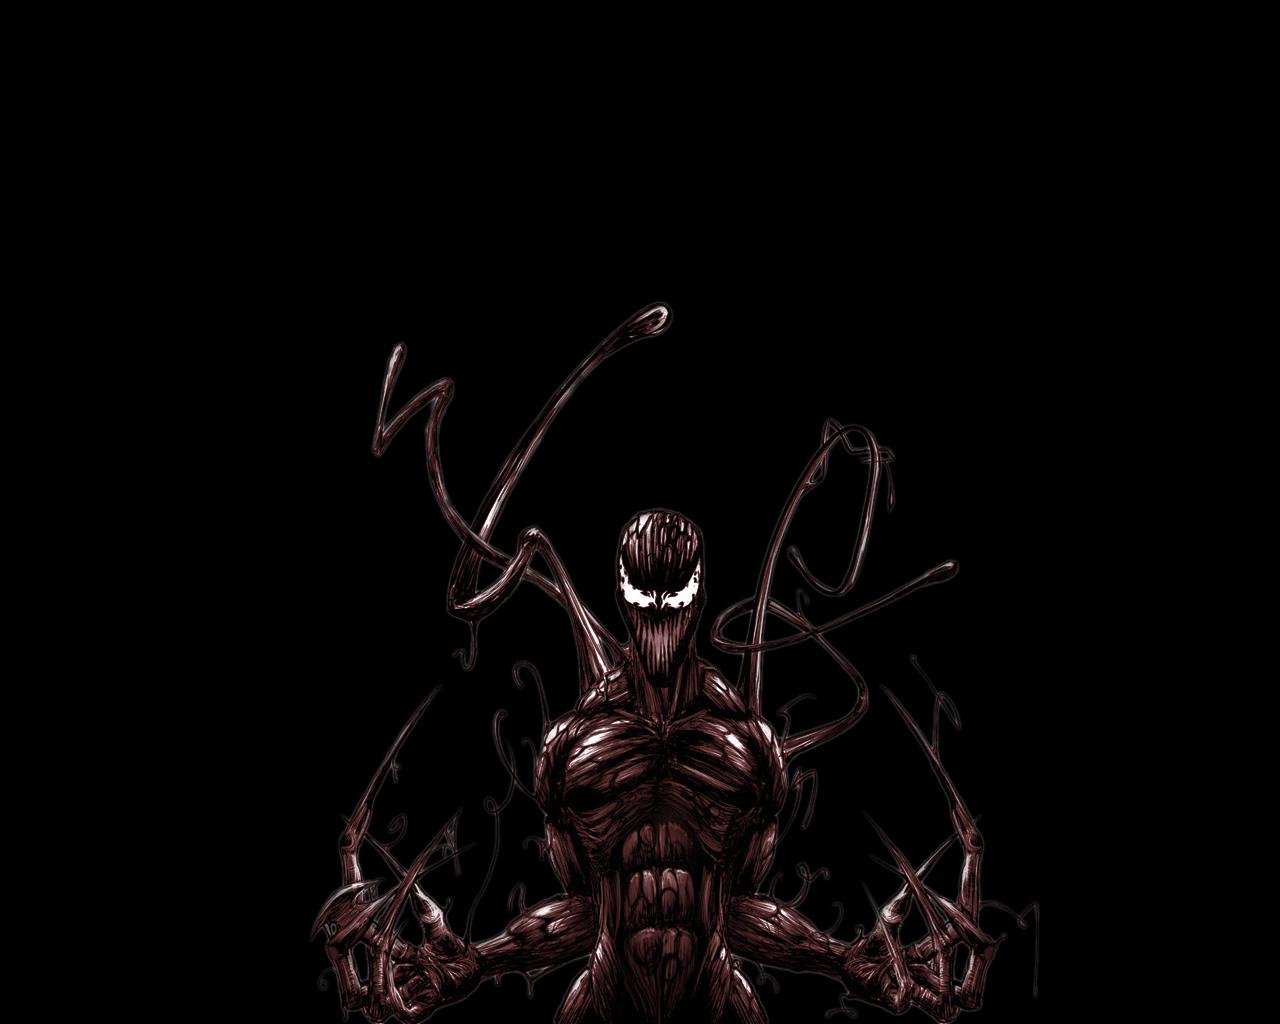 Comics   Carnage Carnage Wallpaper 1280x1024